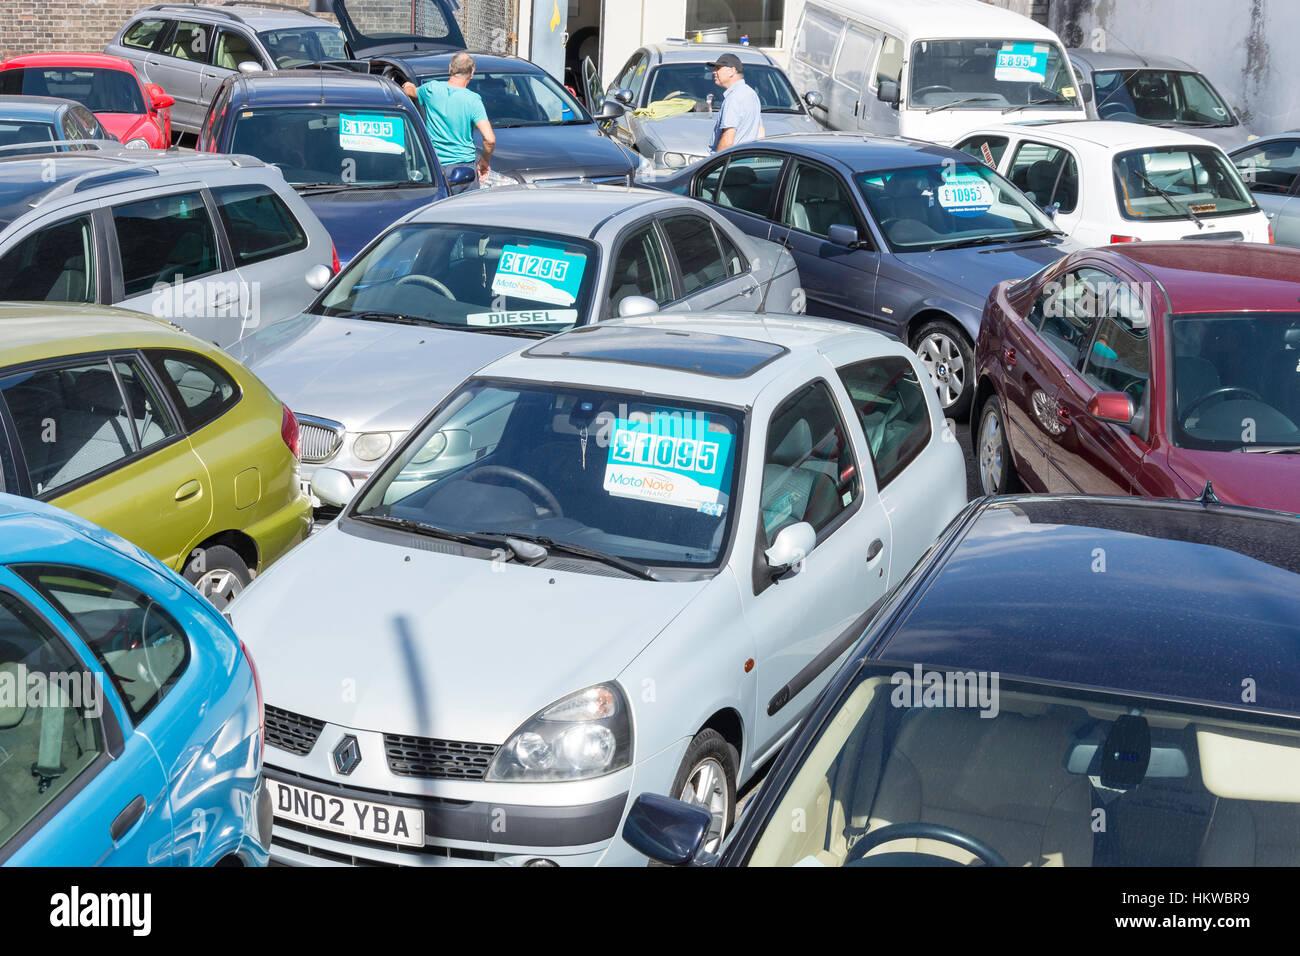 Small car dealers yard, Millbay Road, Plymouth, Devon, England, United Kingdom - Stock Image